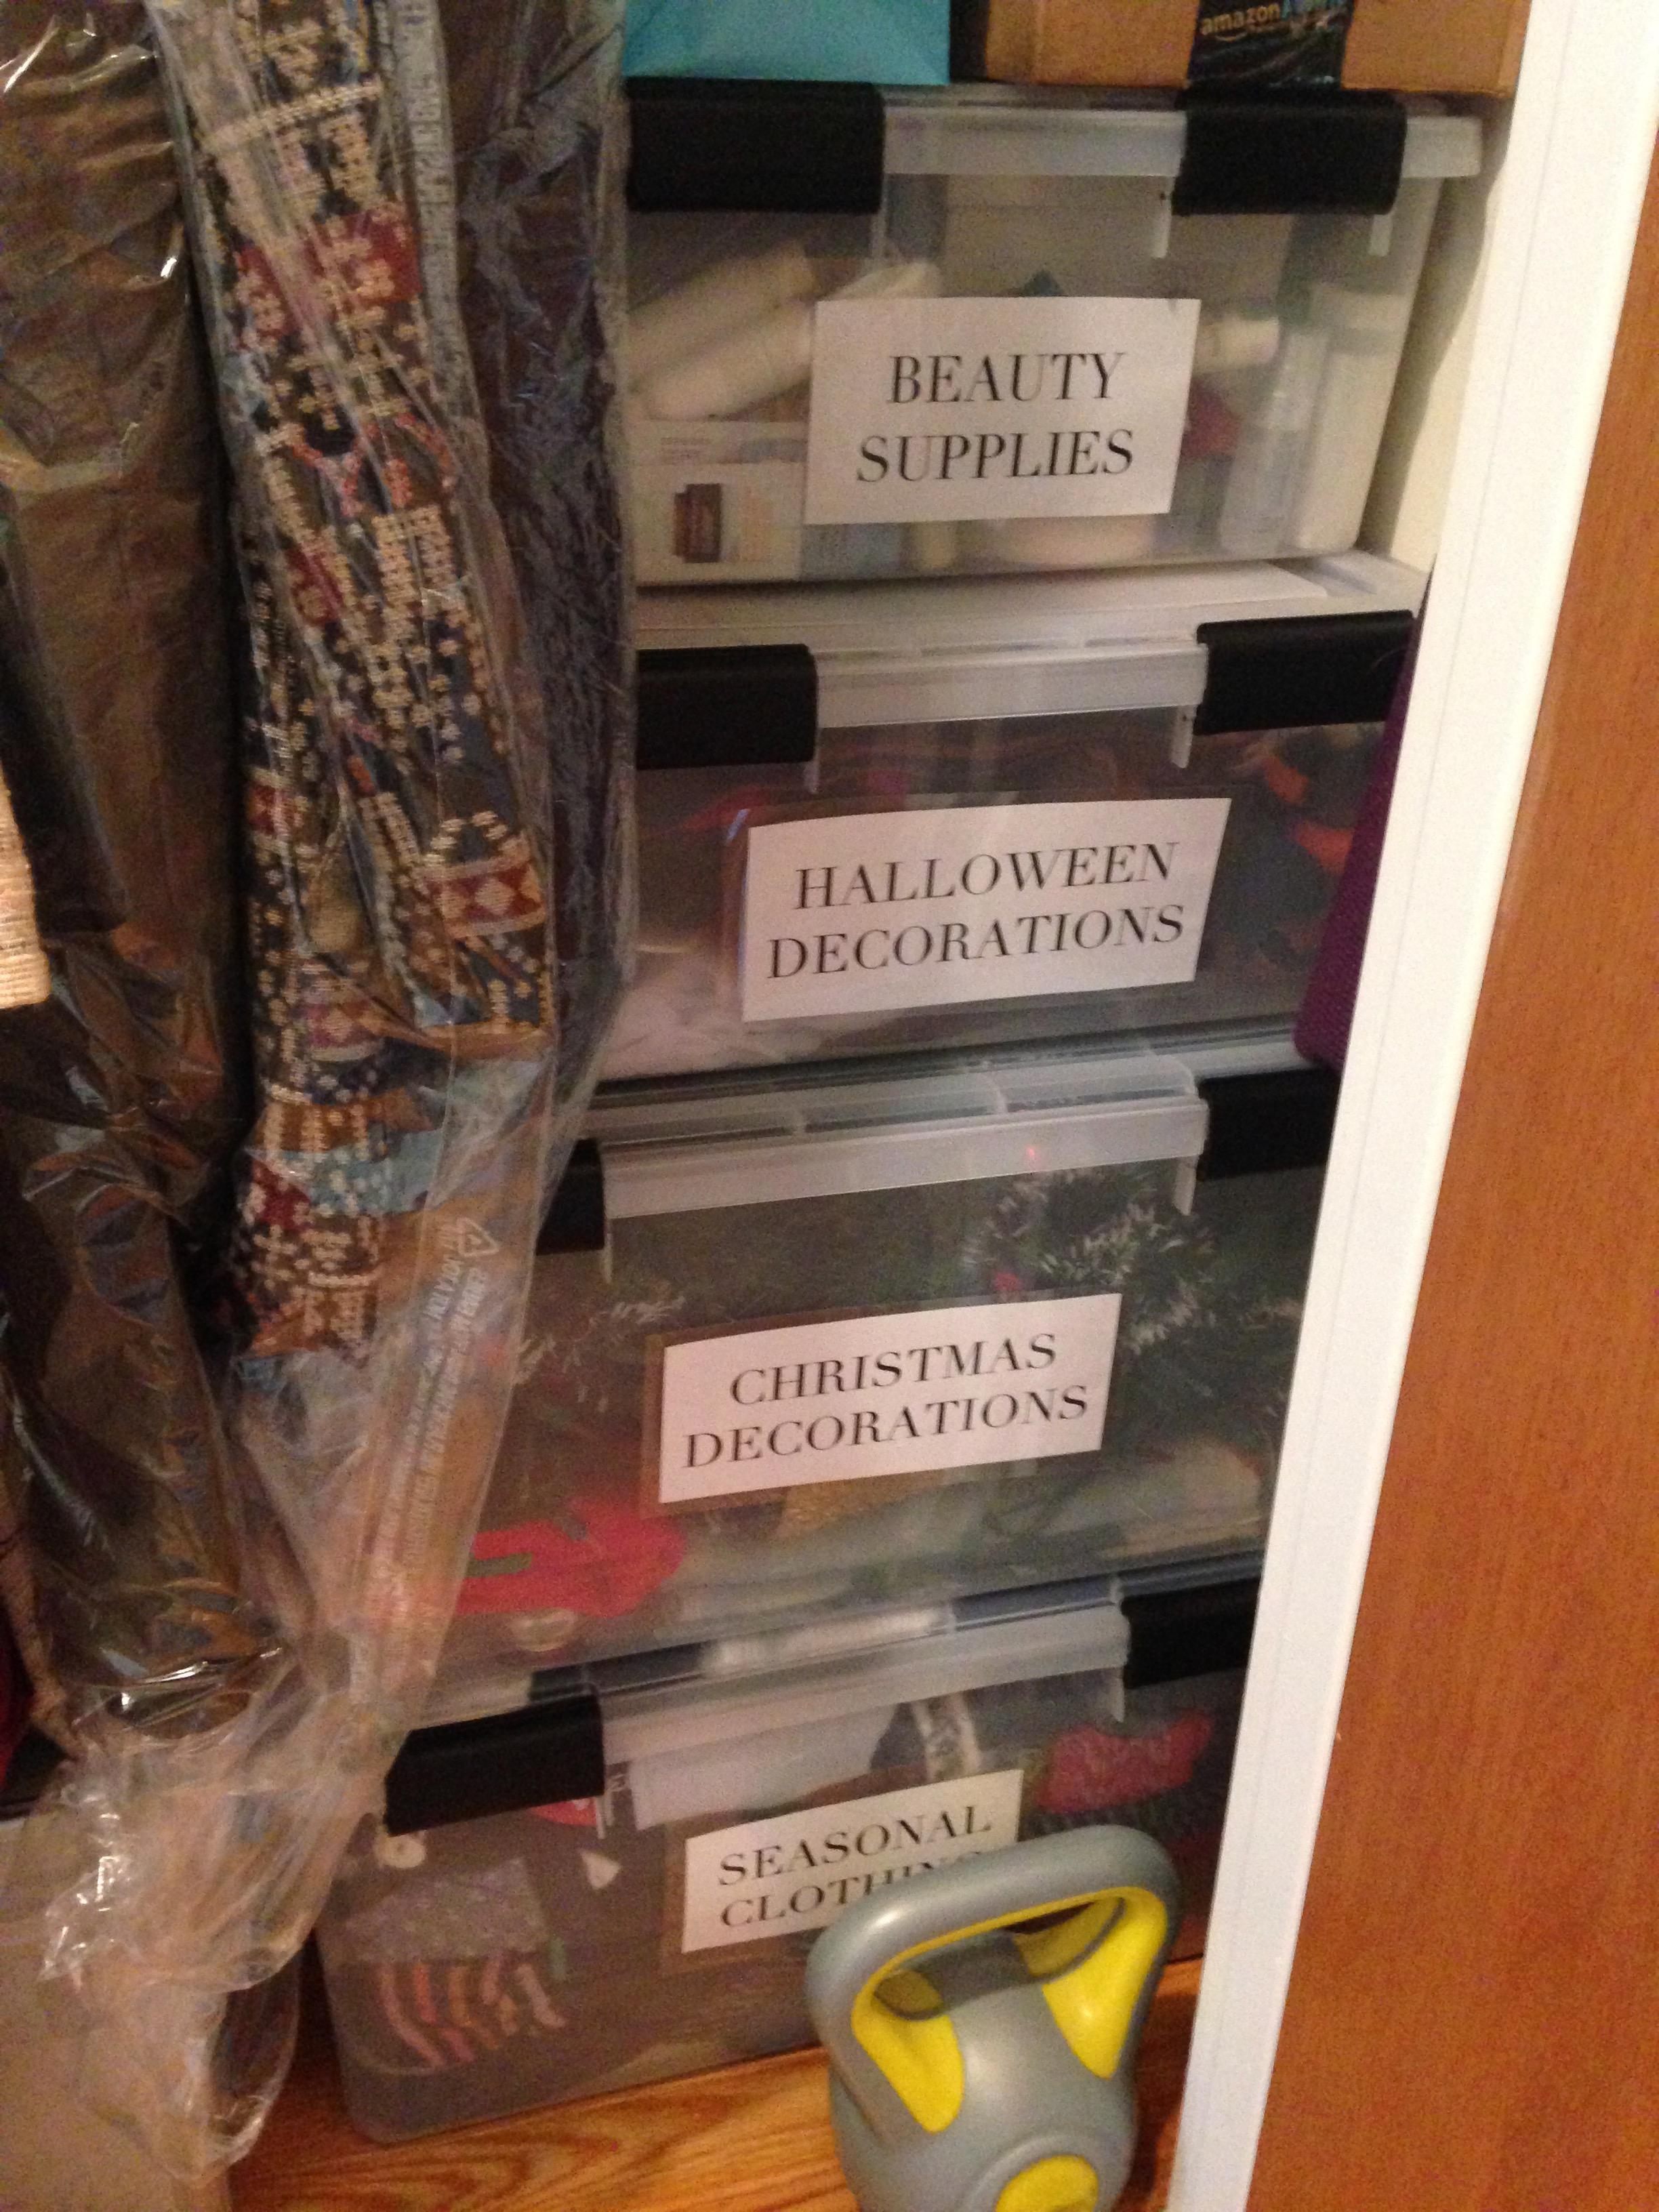 4. Closet storage